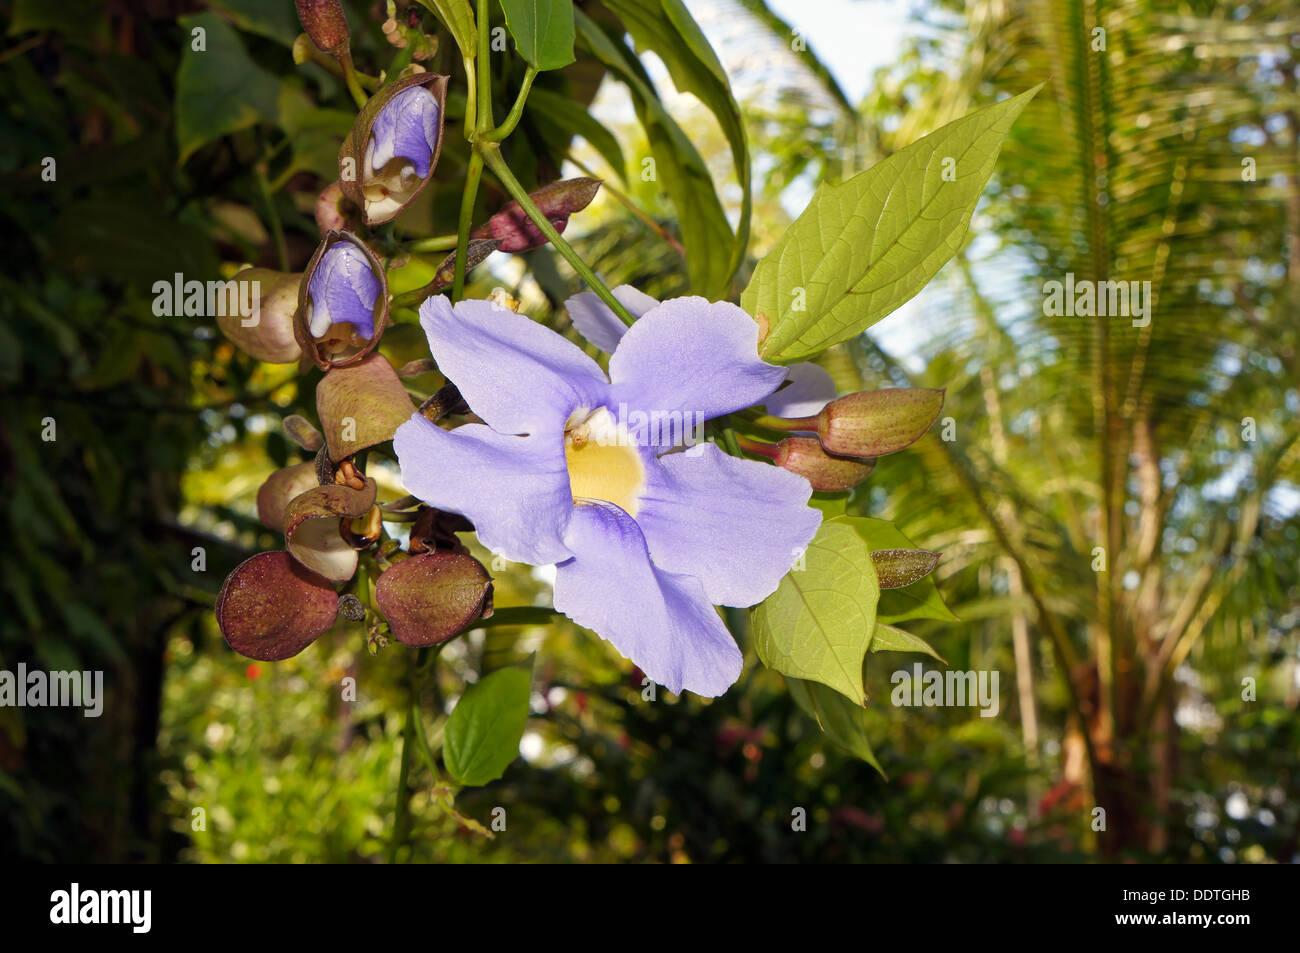 Bengalen Uhr Rebe oder Himmel Blume (Thunbergia Grandiflora) mit Knospen Stockbild